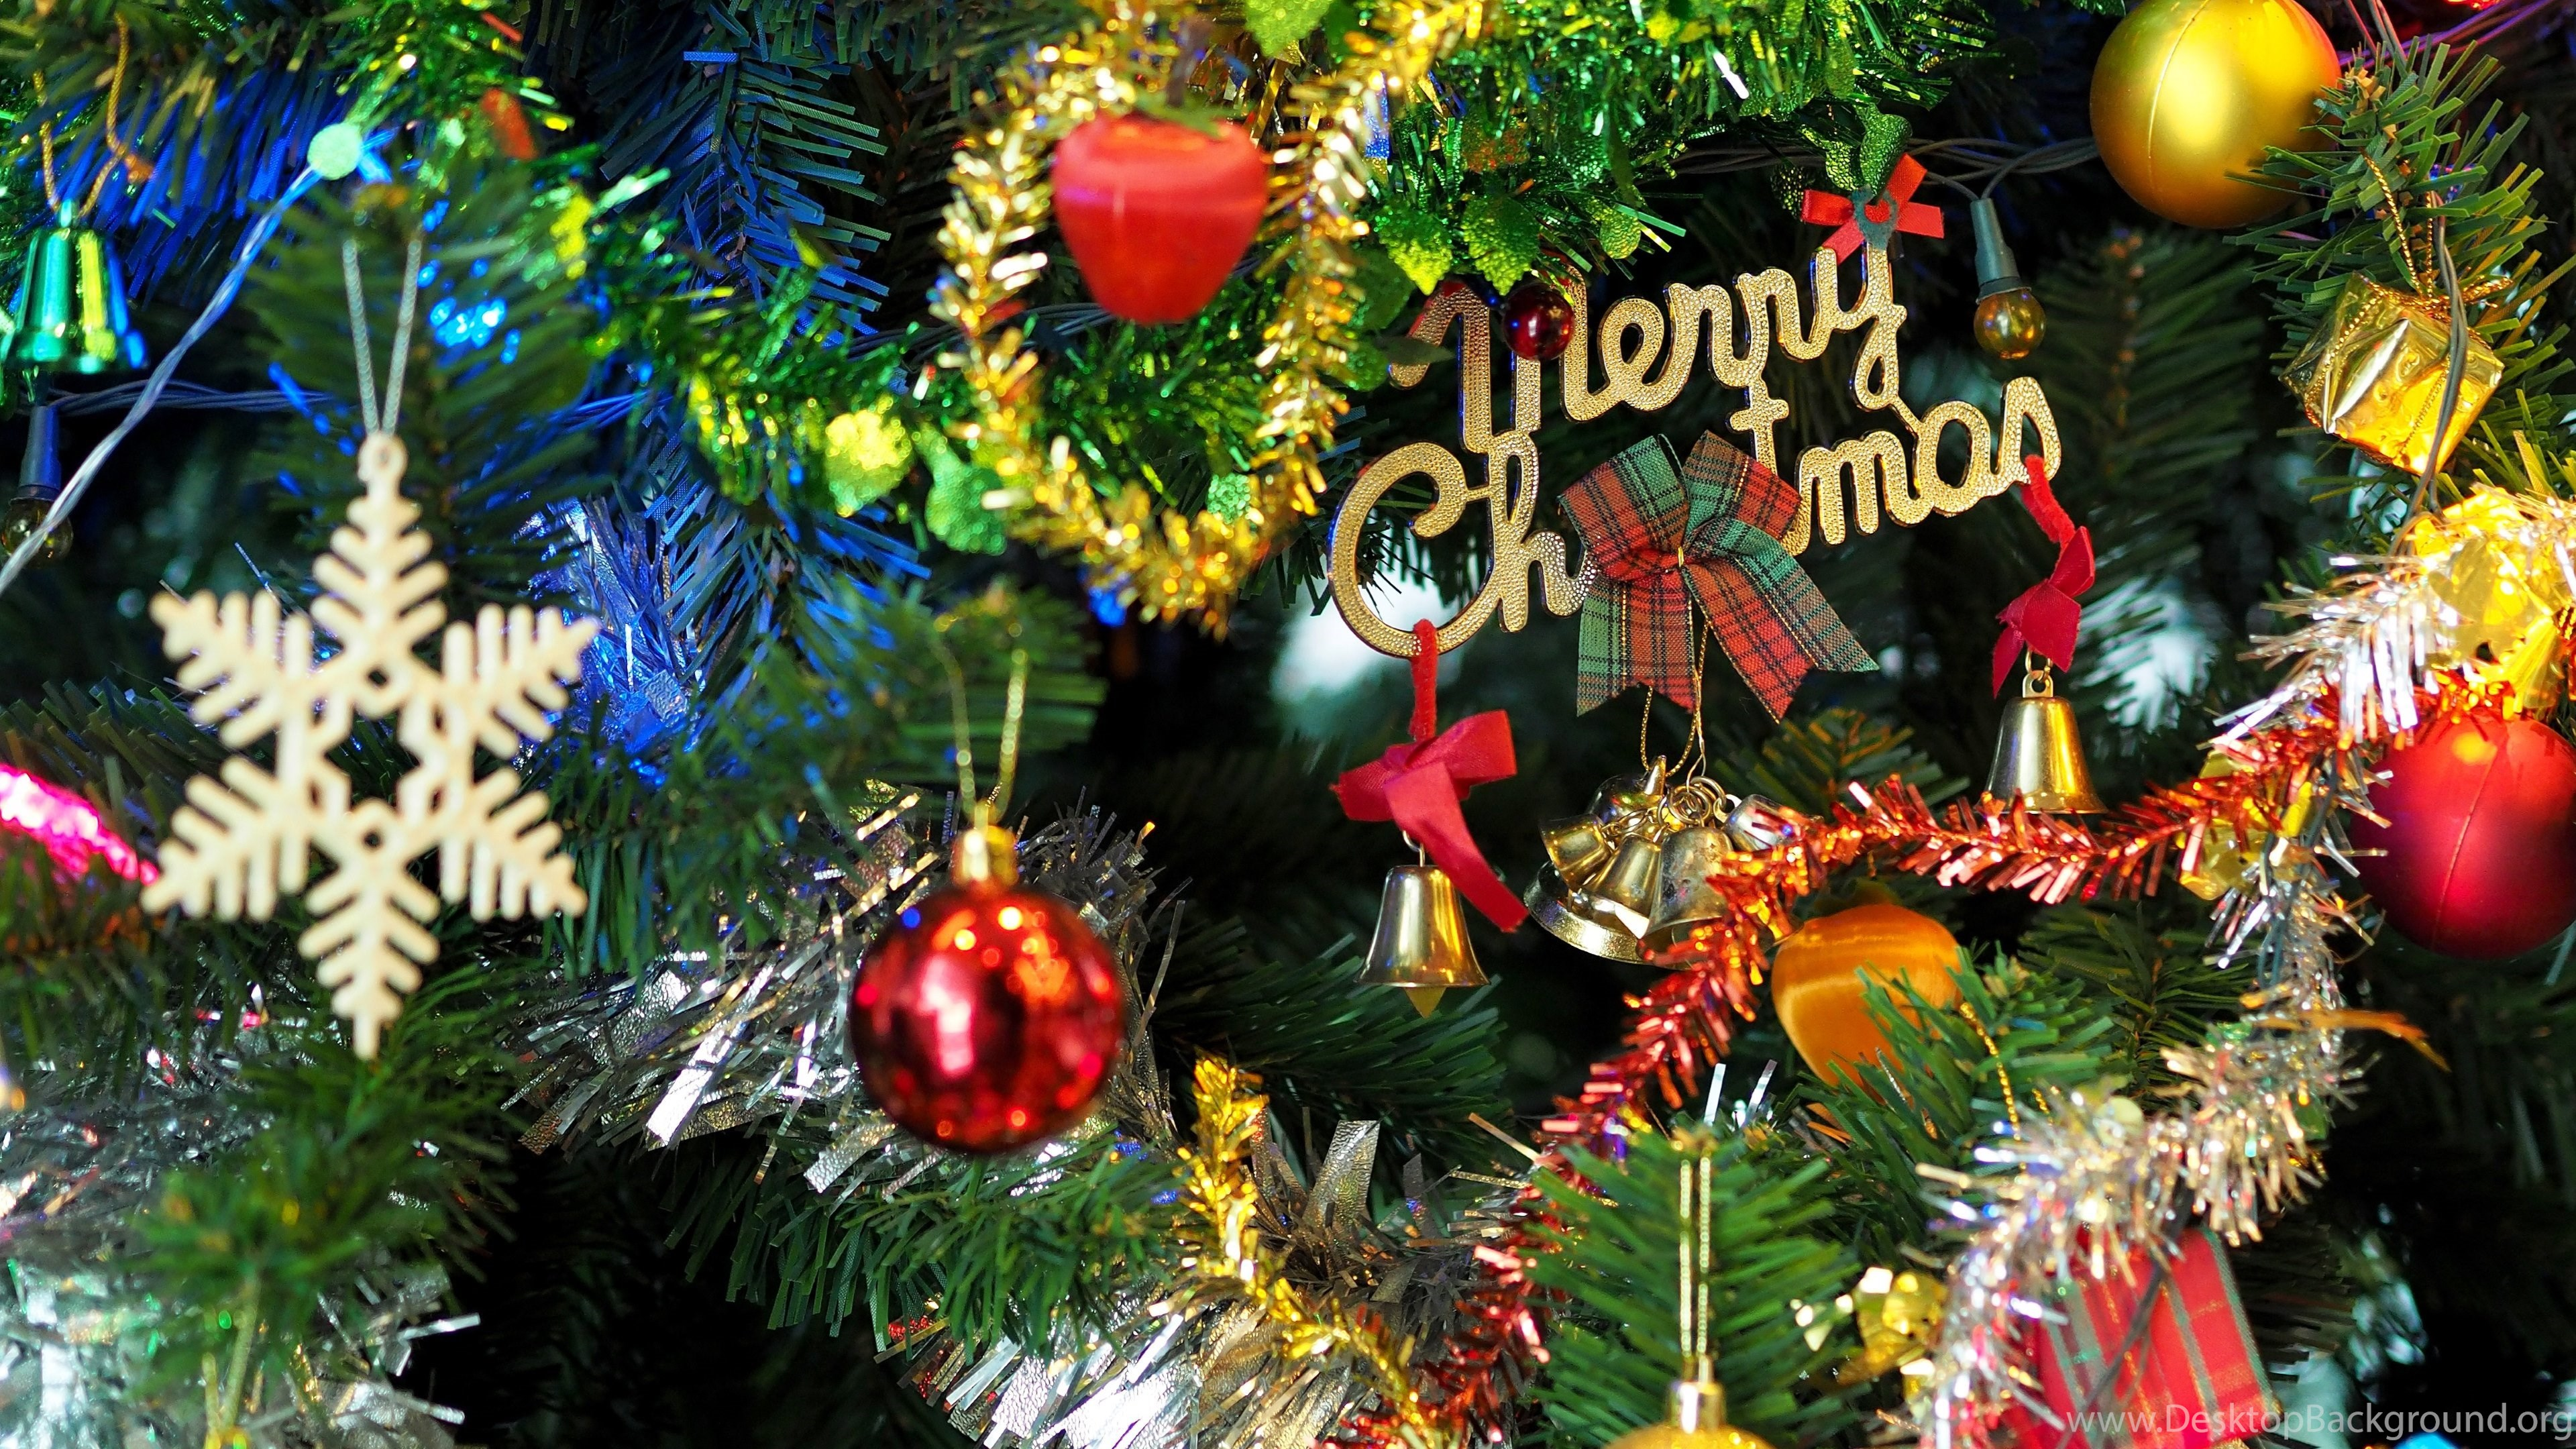 Merry Christmas Christmas Bells HD Wallpapers 4K Wallpapers 3840x2160